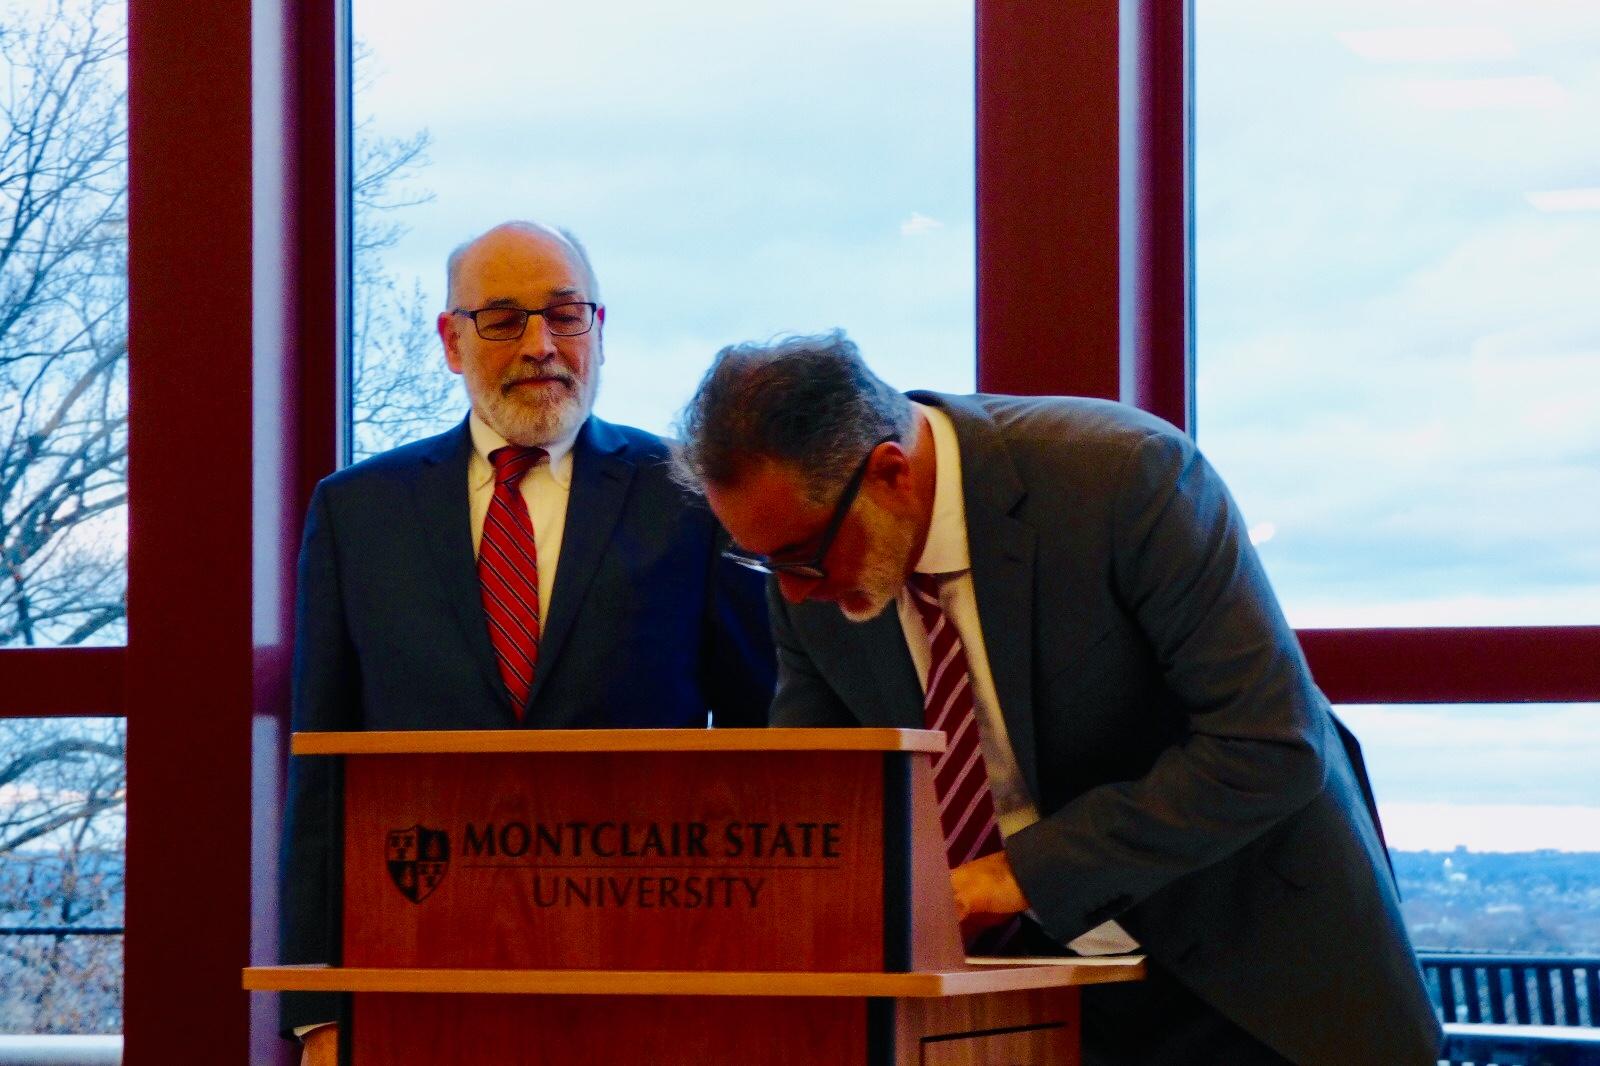 accordo tra la Montclair State University e Learn Italy